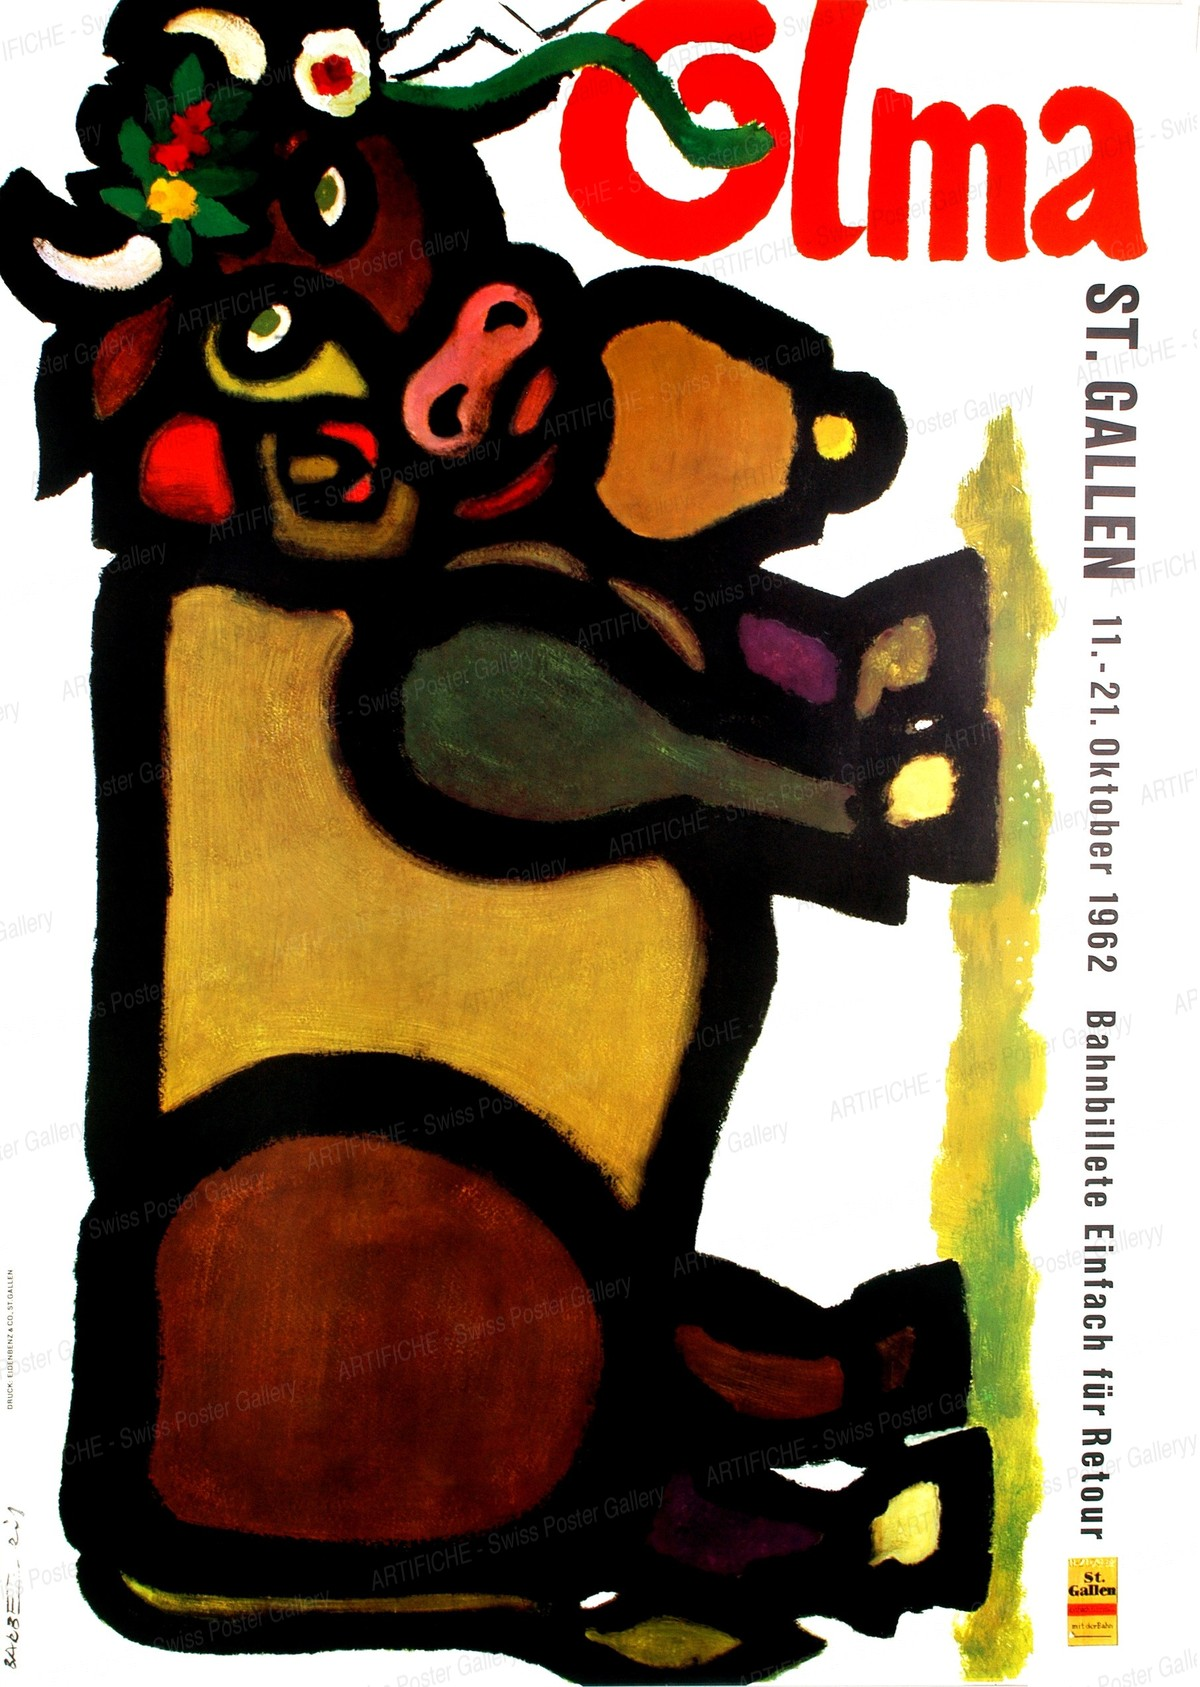 Olma St. Gallen 11. – 21. Oktober 1962, Franco Barberis